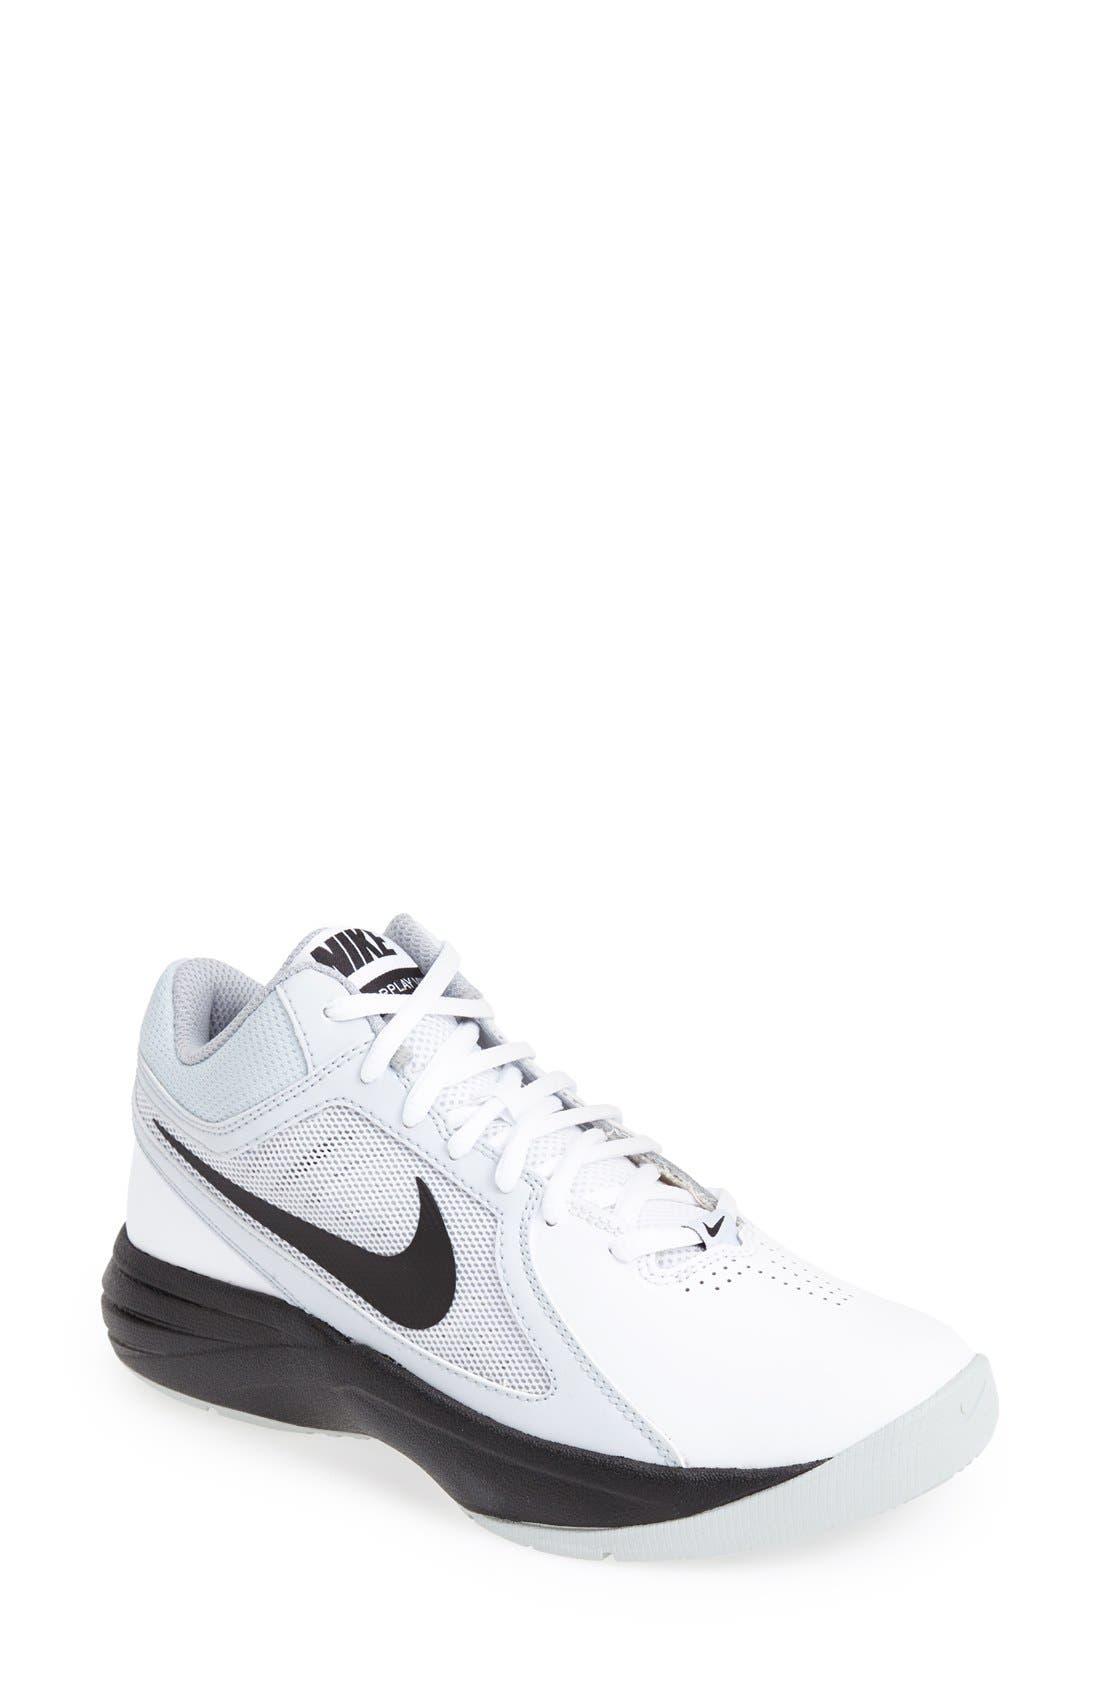 Main Image - Nike 'Overplay VIII' Basketball Shoe ...